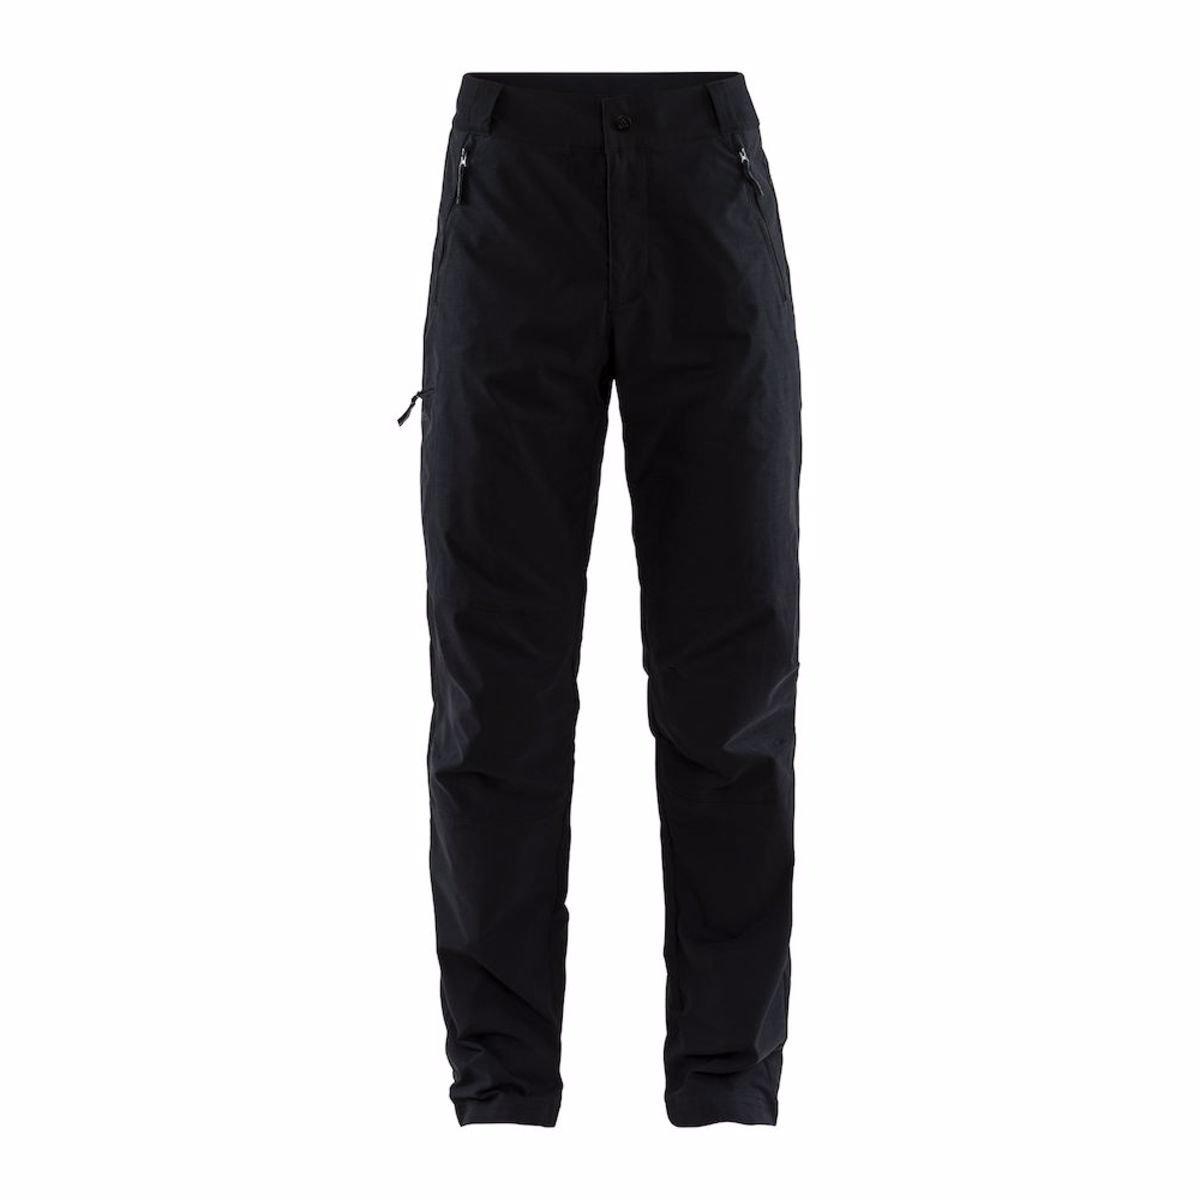 Craft Nohavice Casual čierna XL